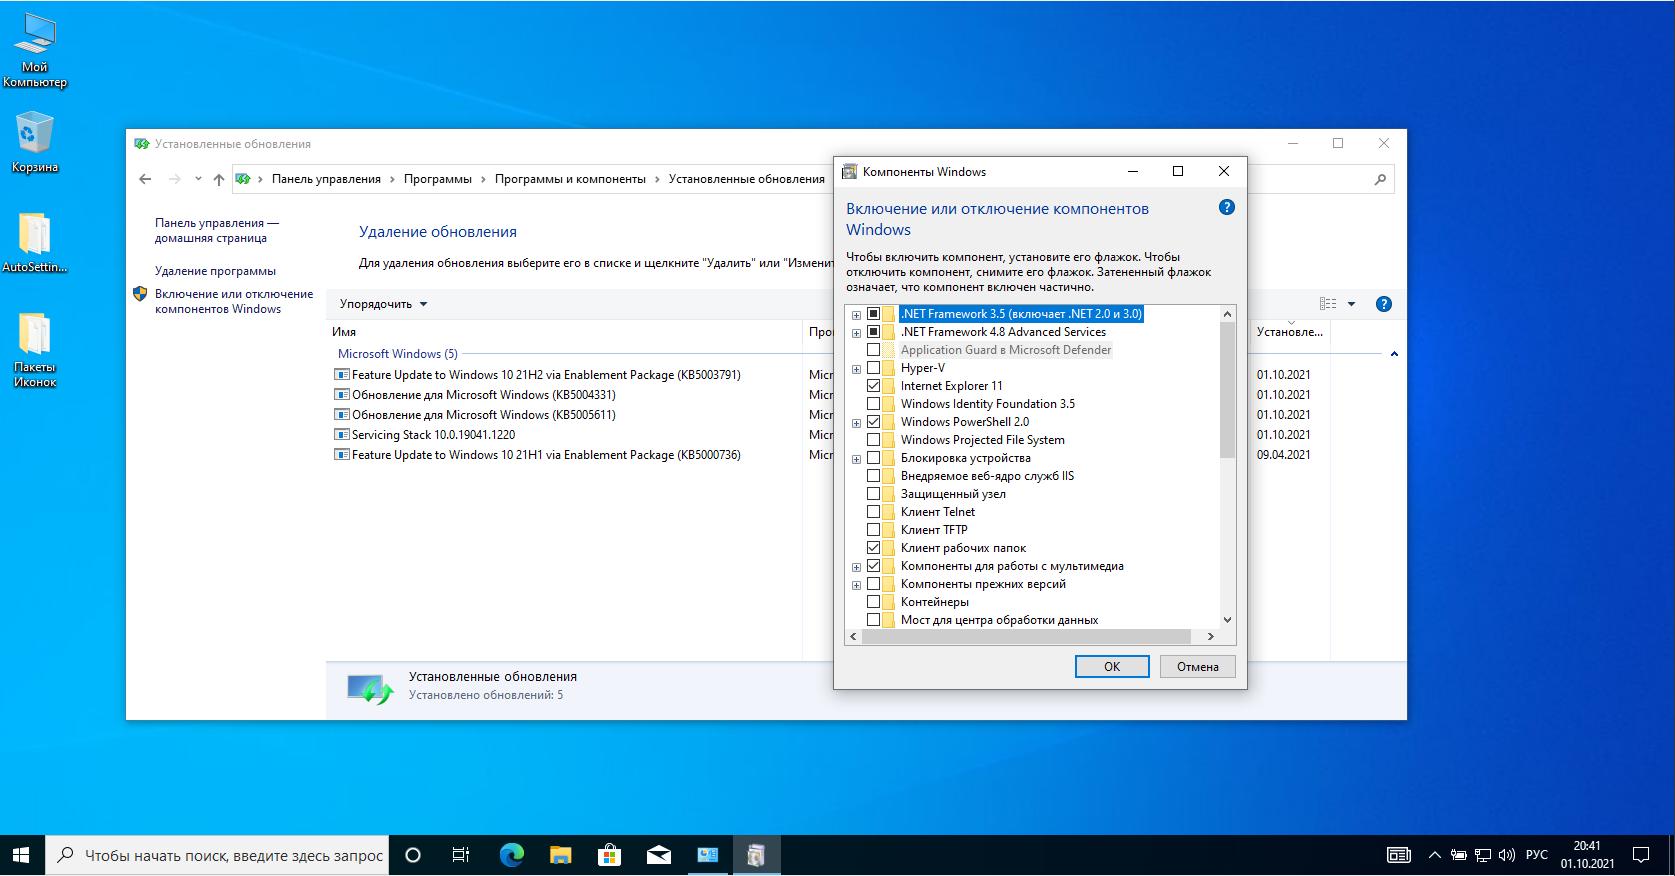 Windows 10 21H2 Build 19044.1266 x64 (01.10.2021)by ArtZak1